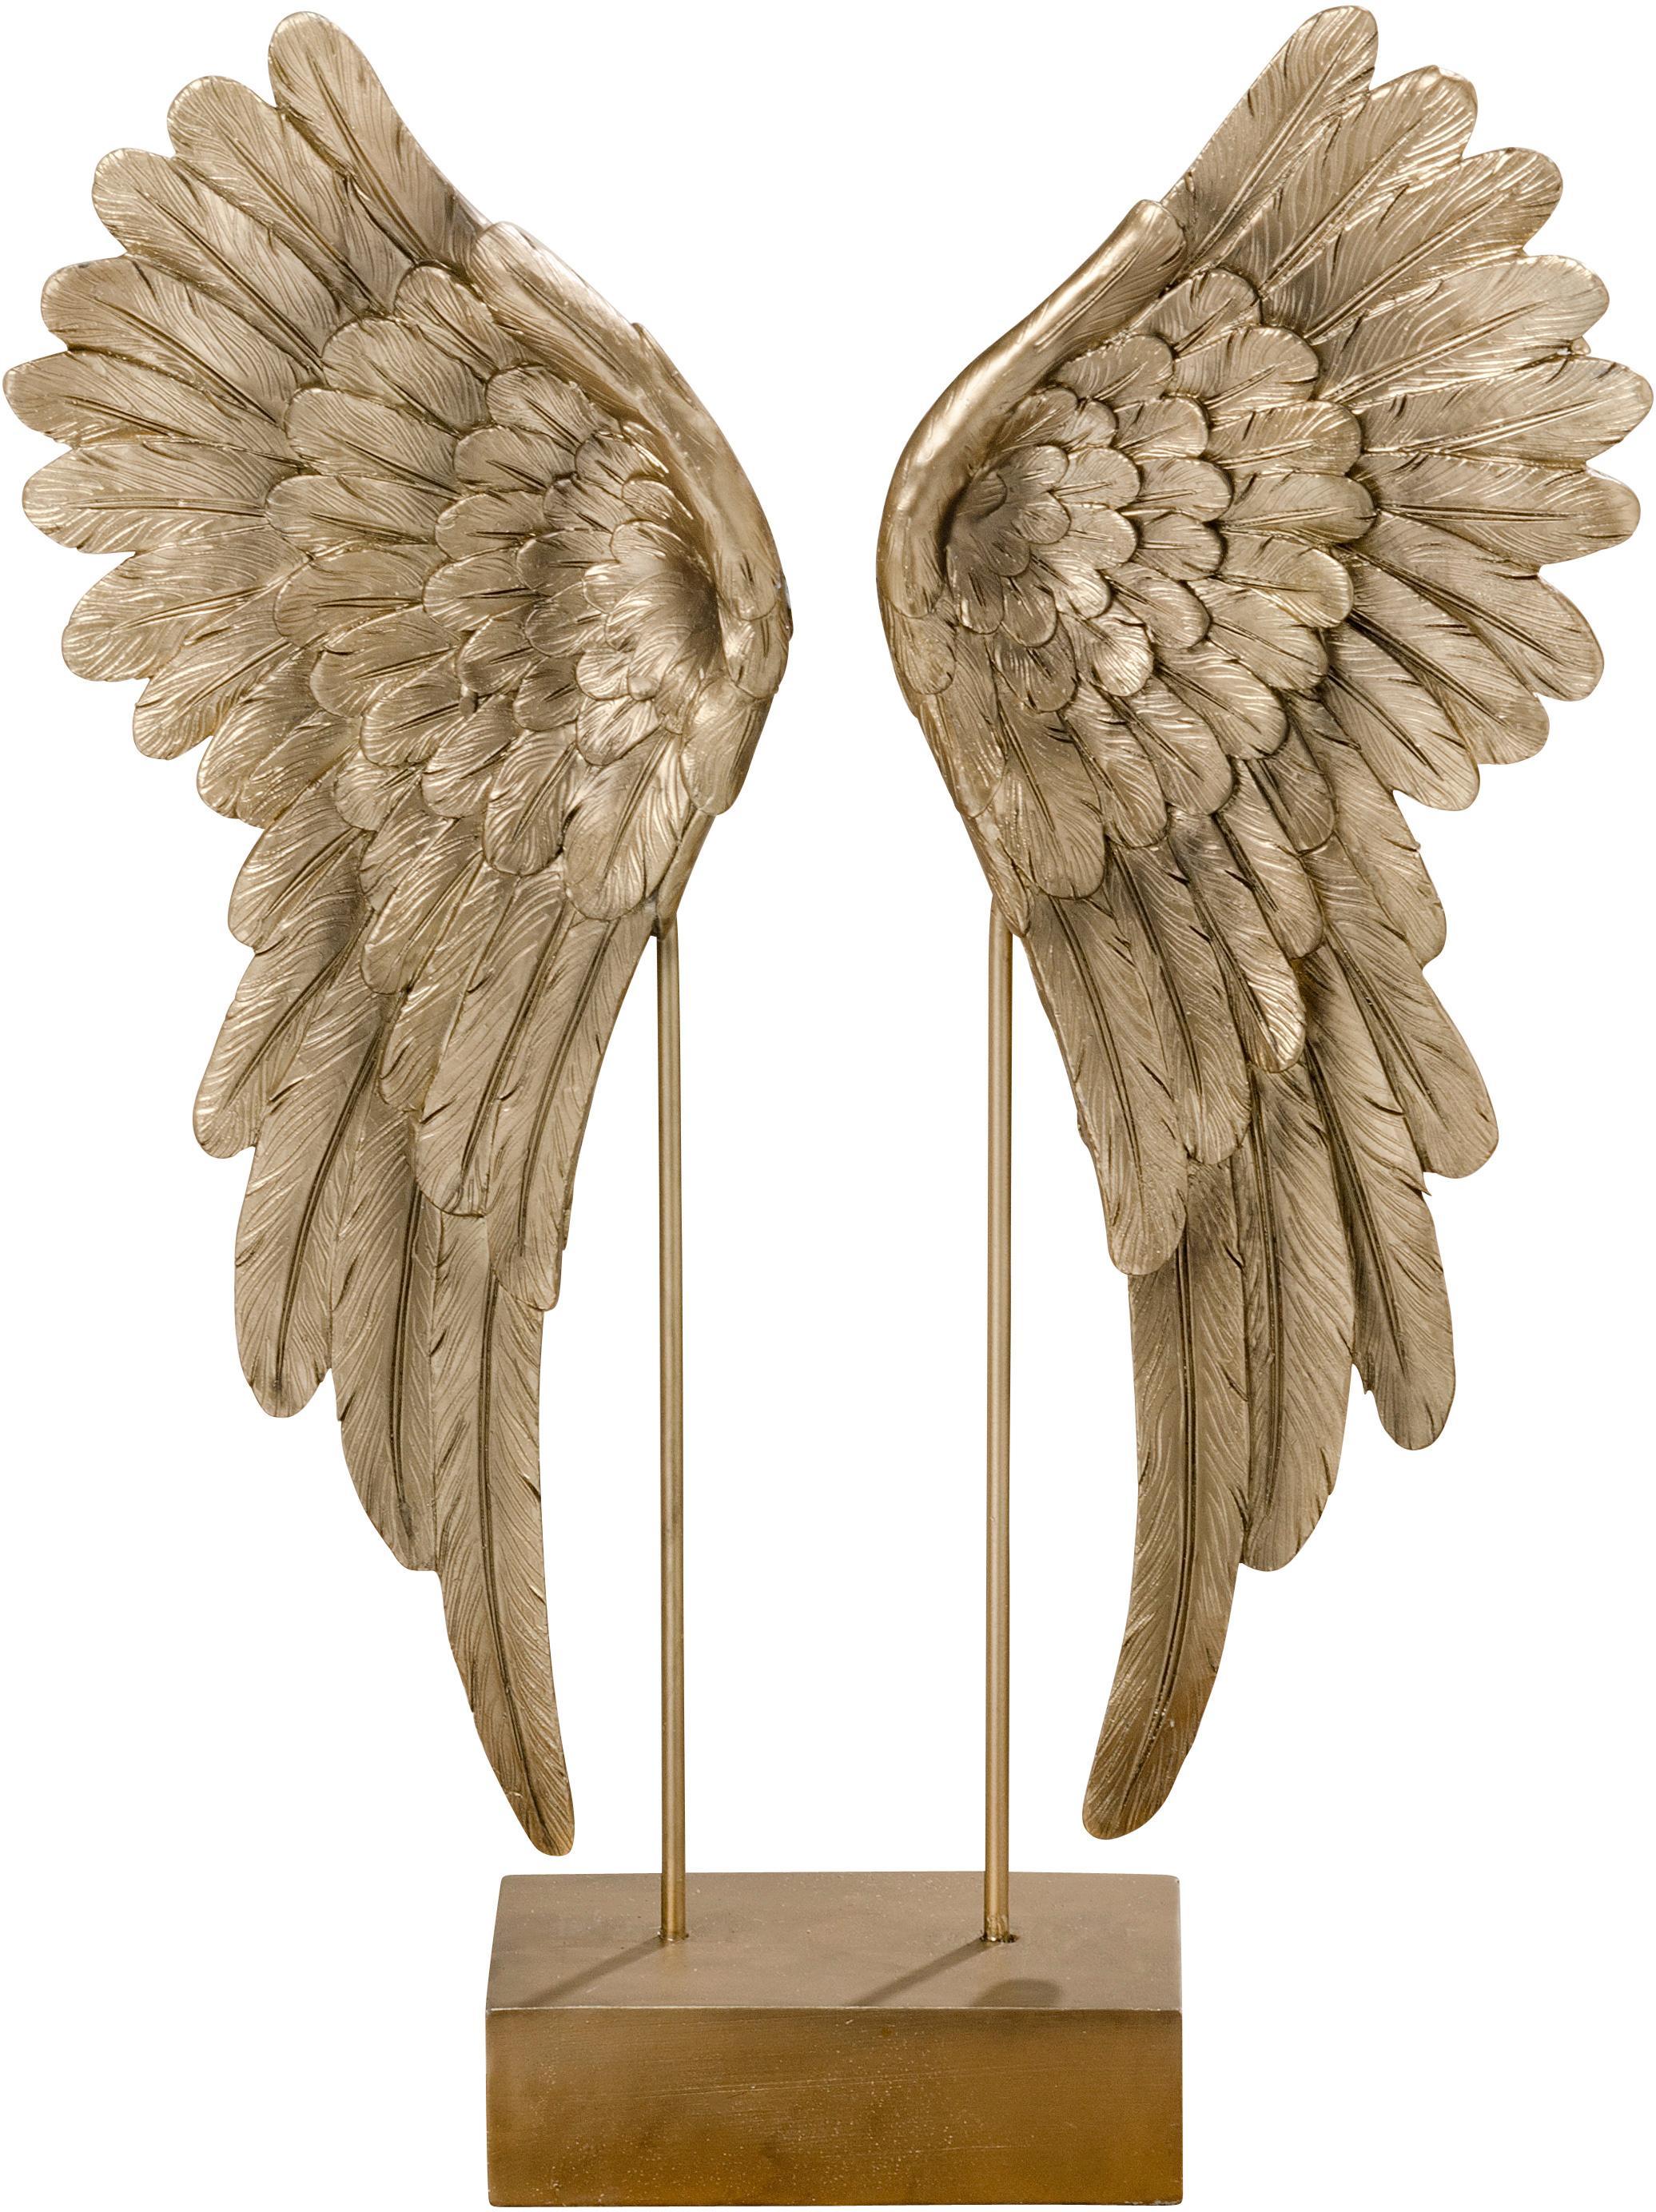 Home Affaire Engelsflügel »Cosmo« | Dekoration > Figuren und Skulpturen > Engel | Goldfarben | HOME AFFAIRE